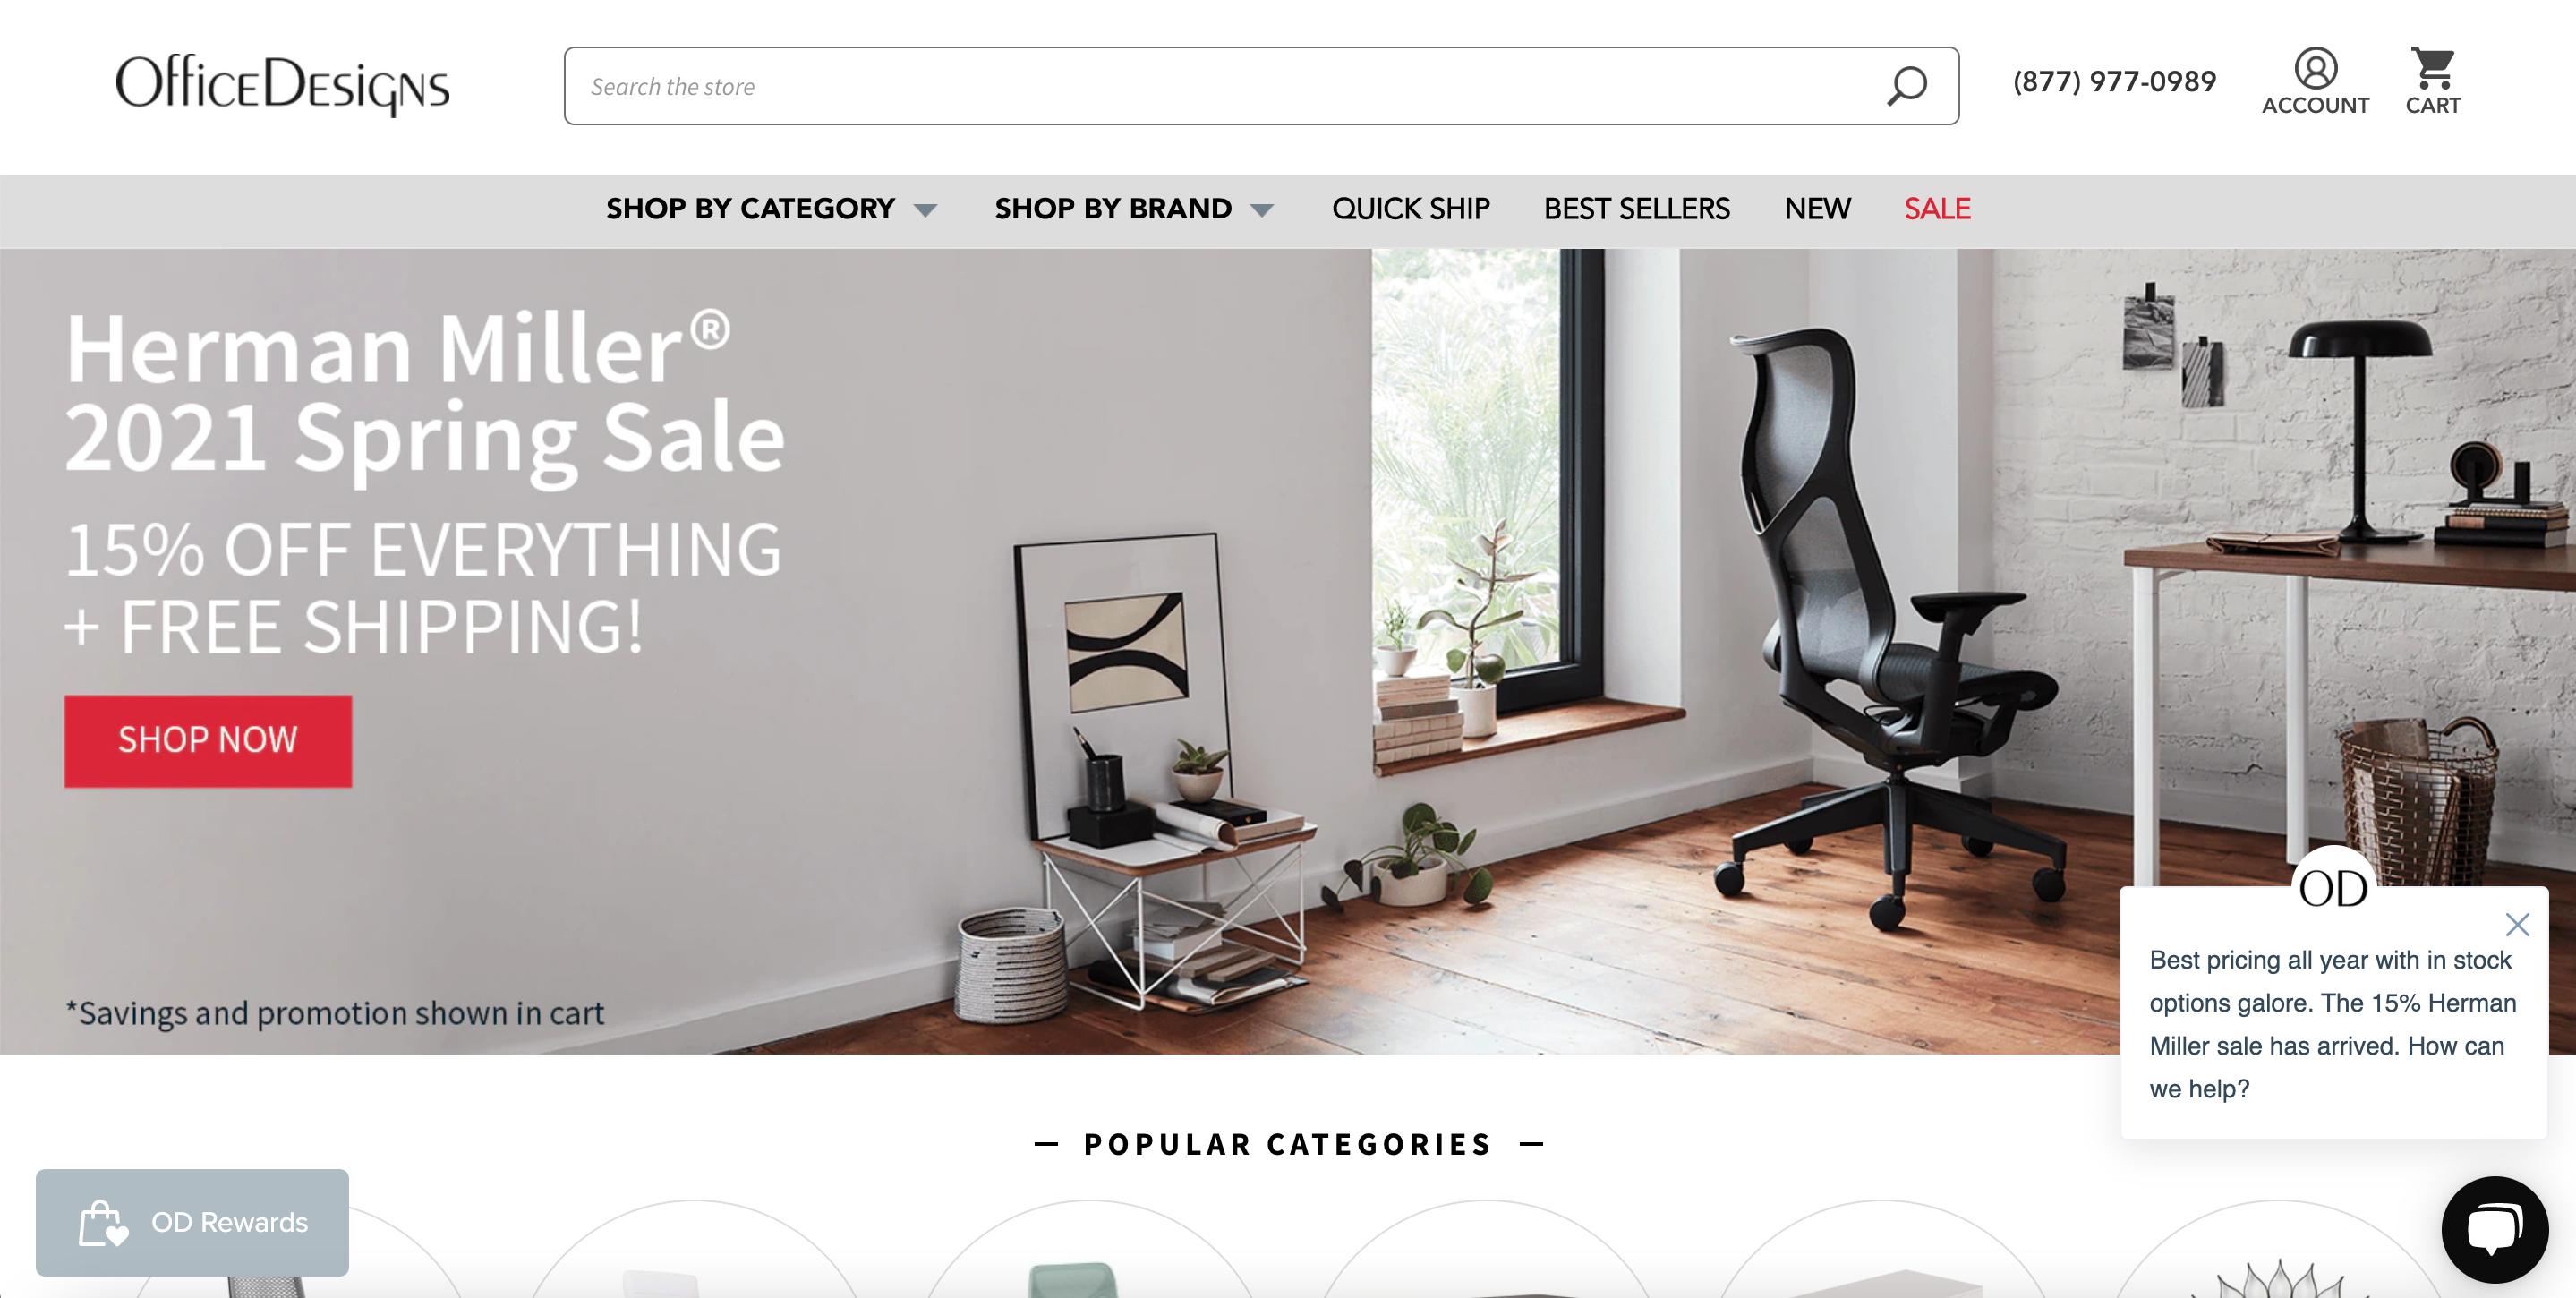 Office Designs - EYStudios Client